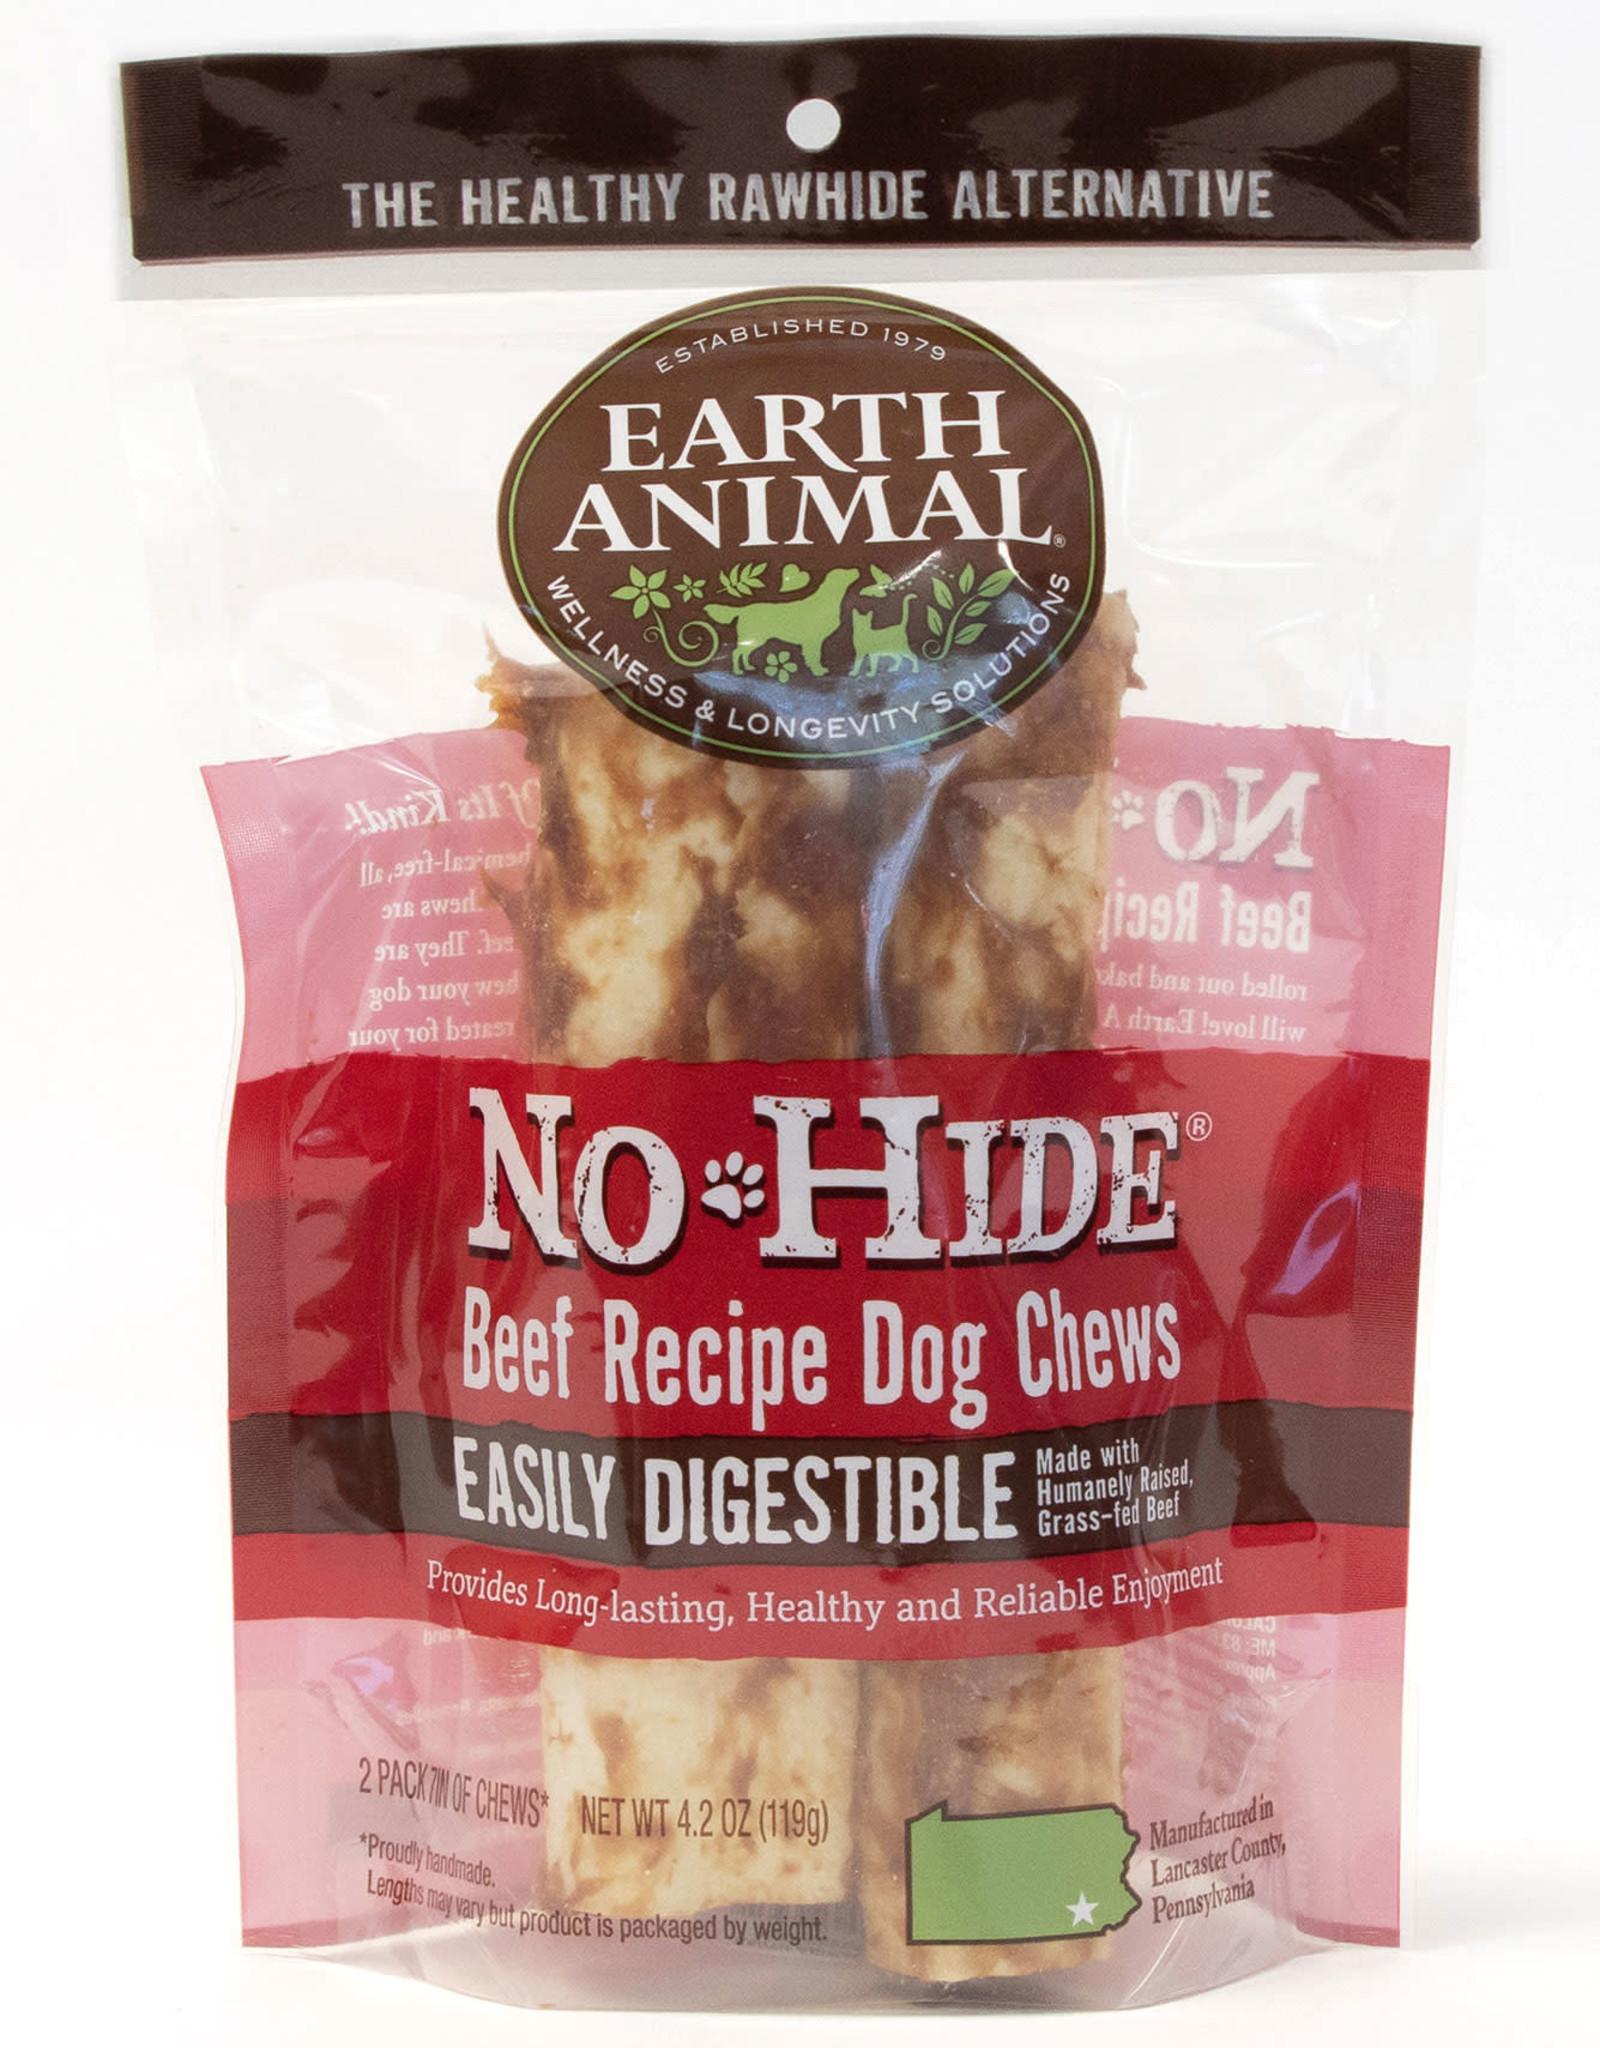 Earth Animal No Hide Beef Recipe Chews 2 pack